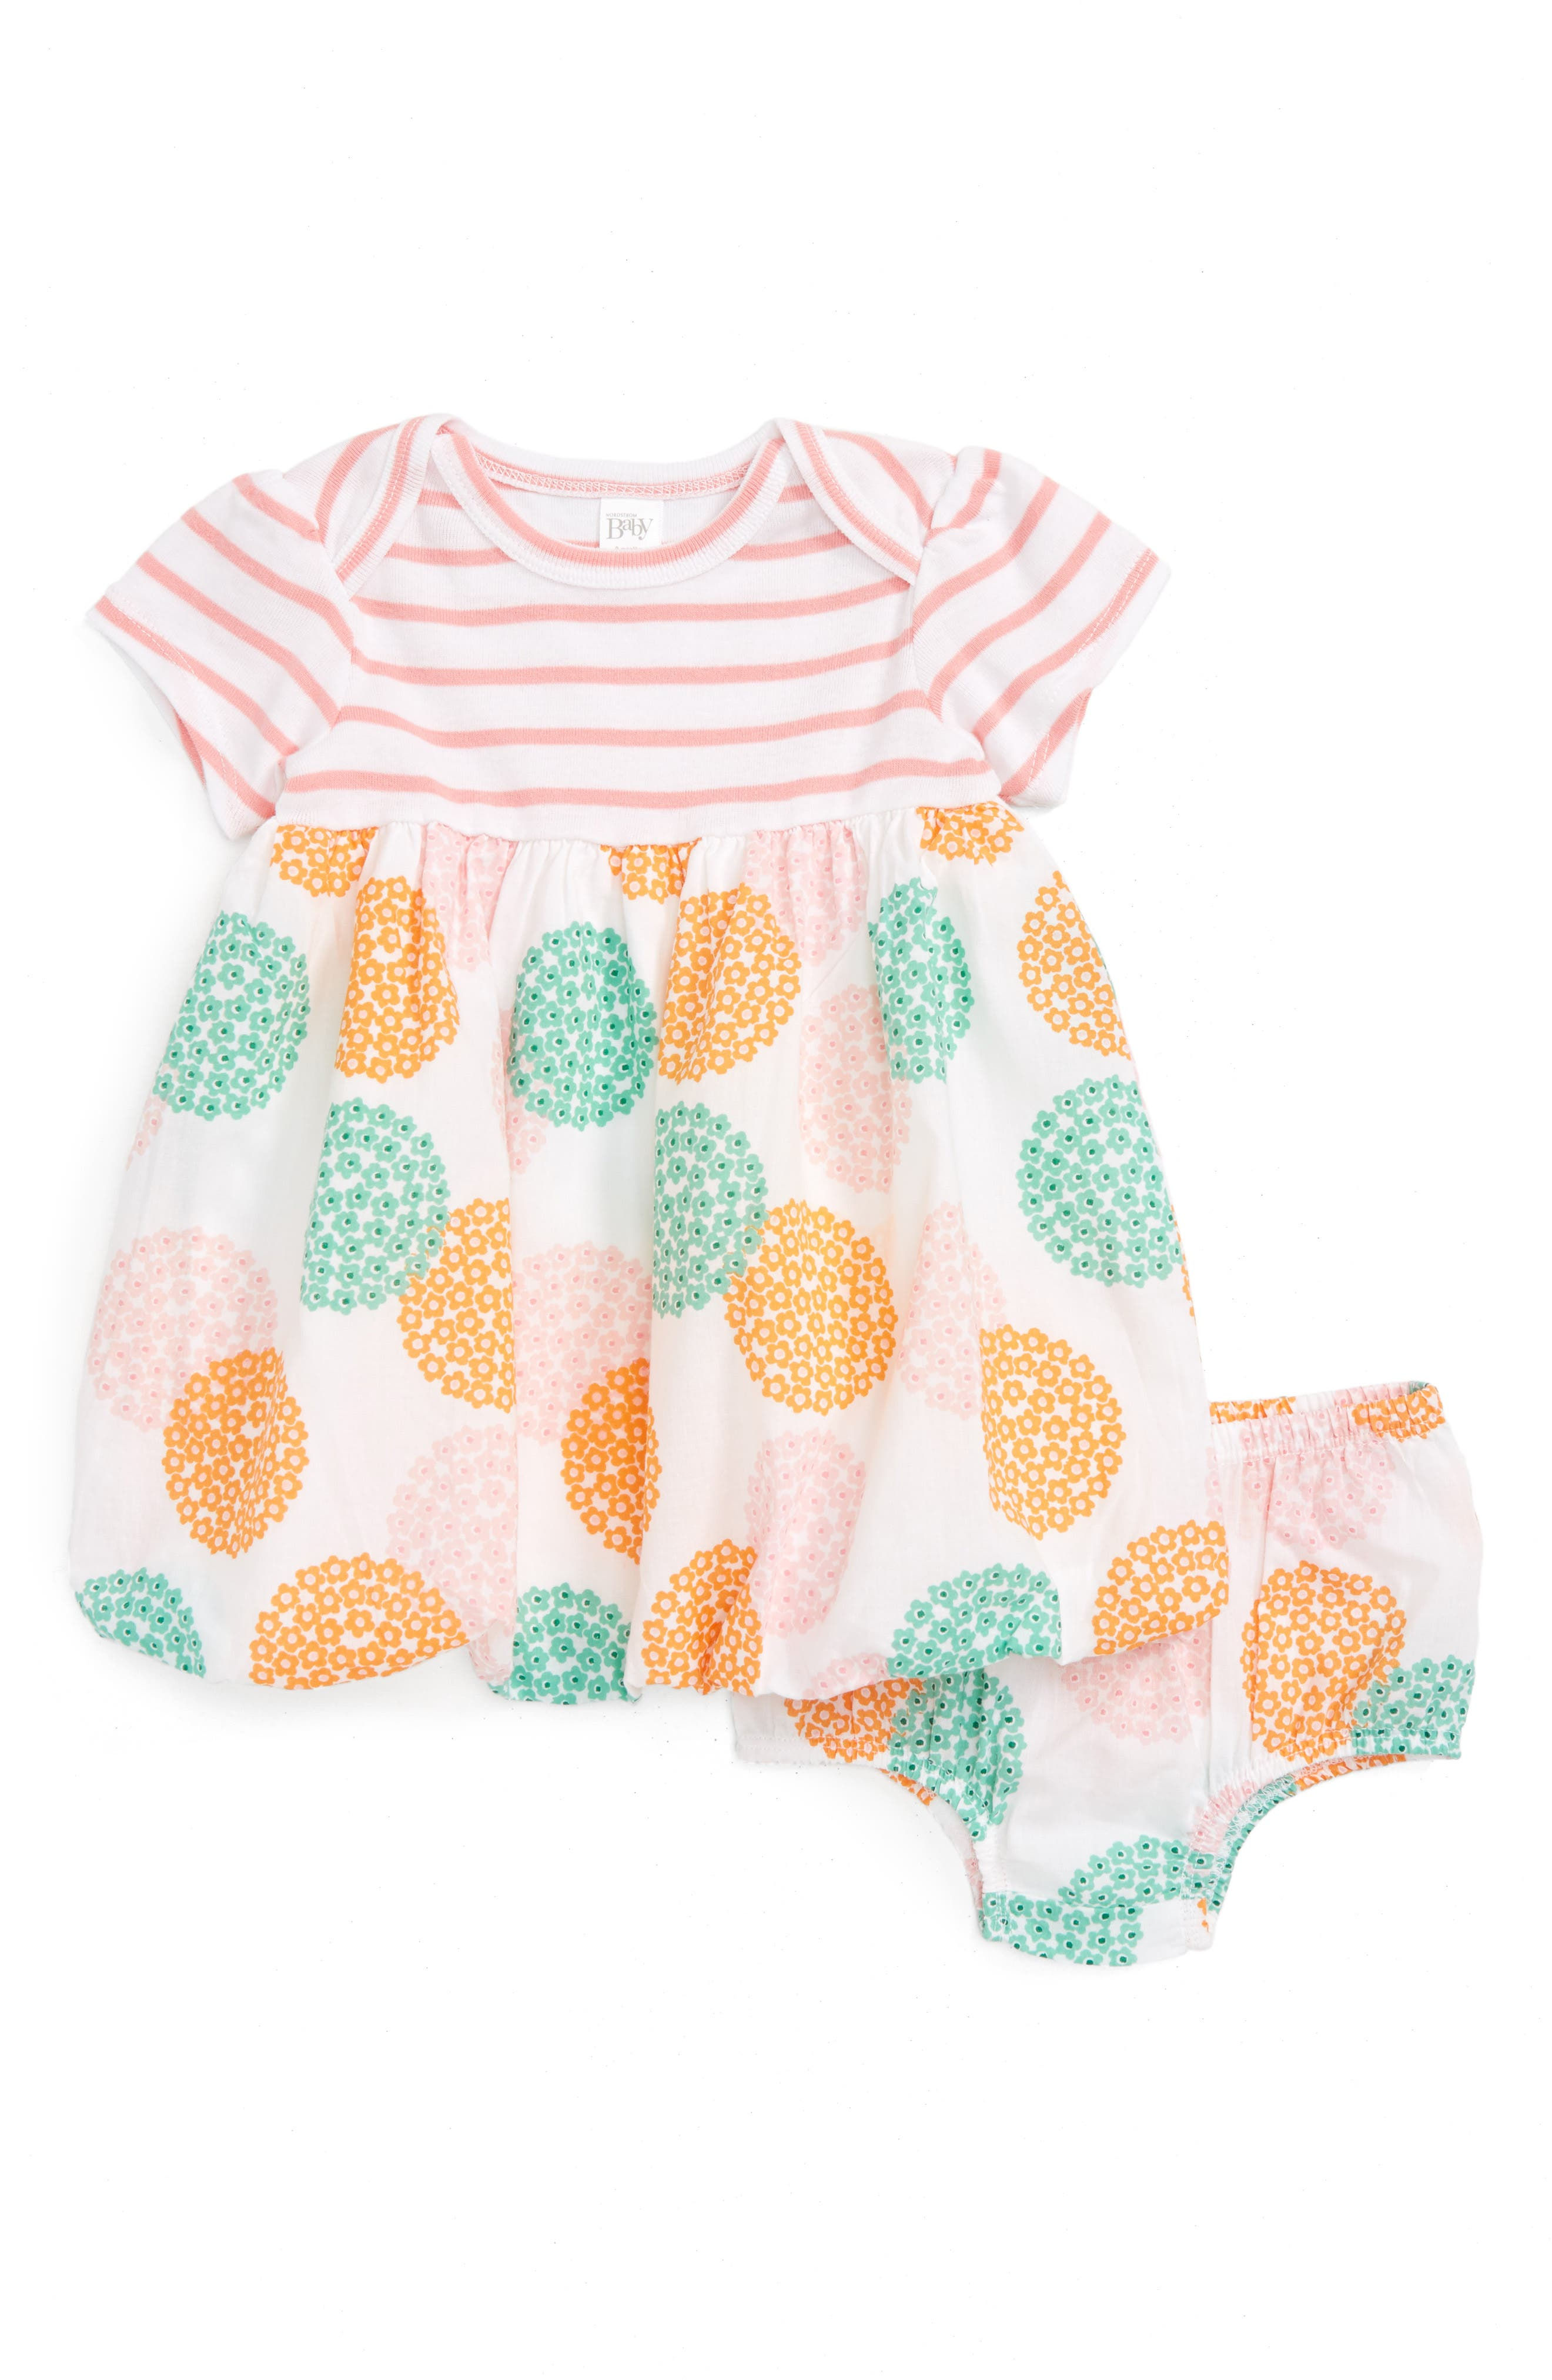 NORDSTROM BABY,                             Bubble Dress,                             Alternate thumbnail 2, color,                             100